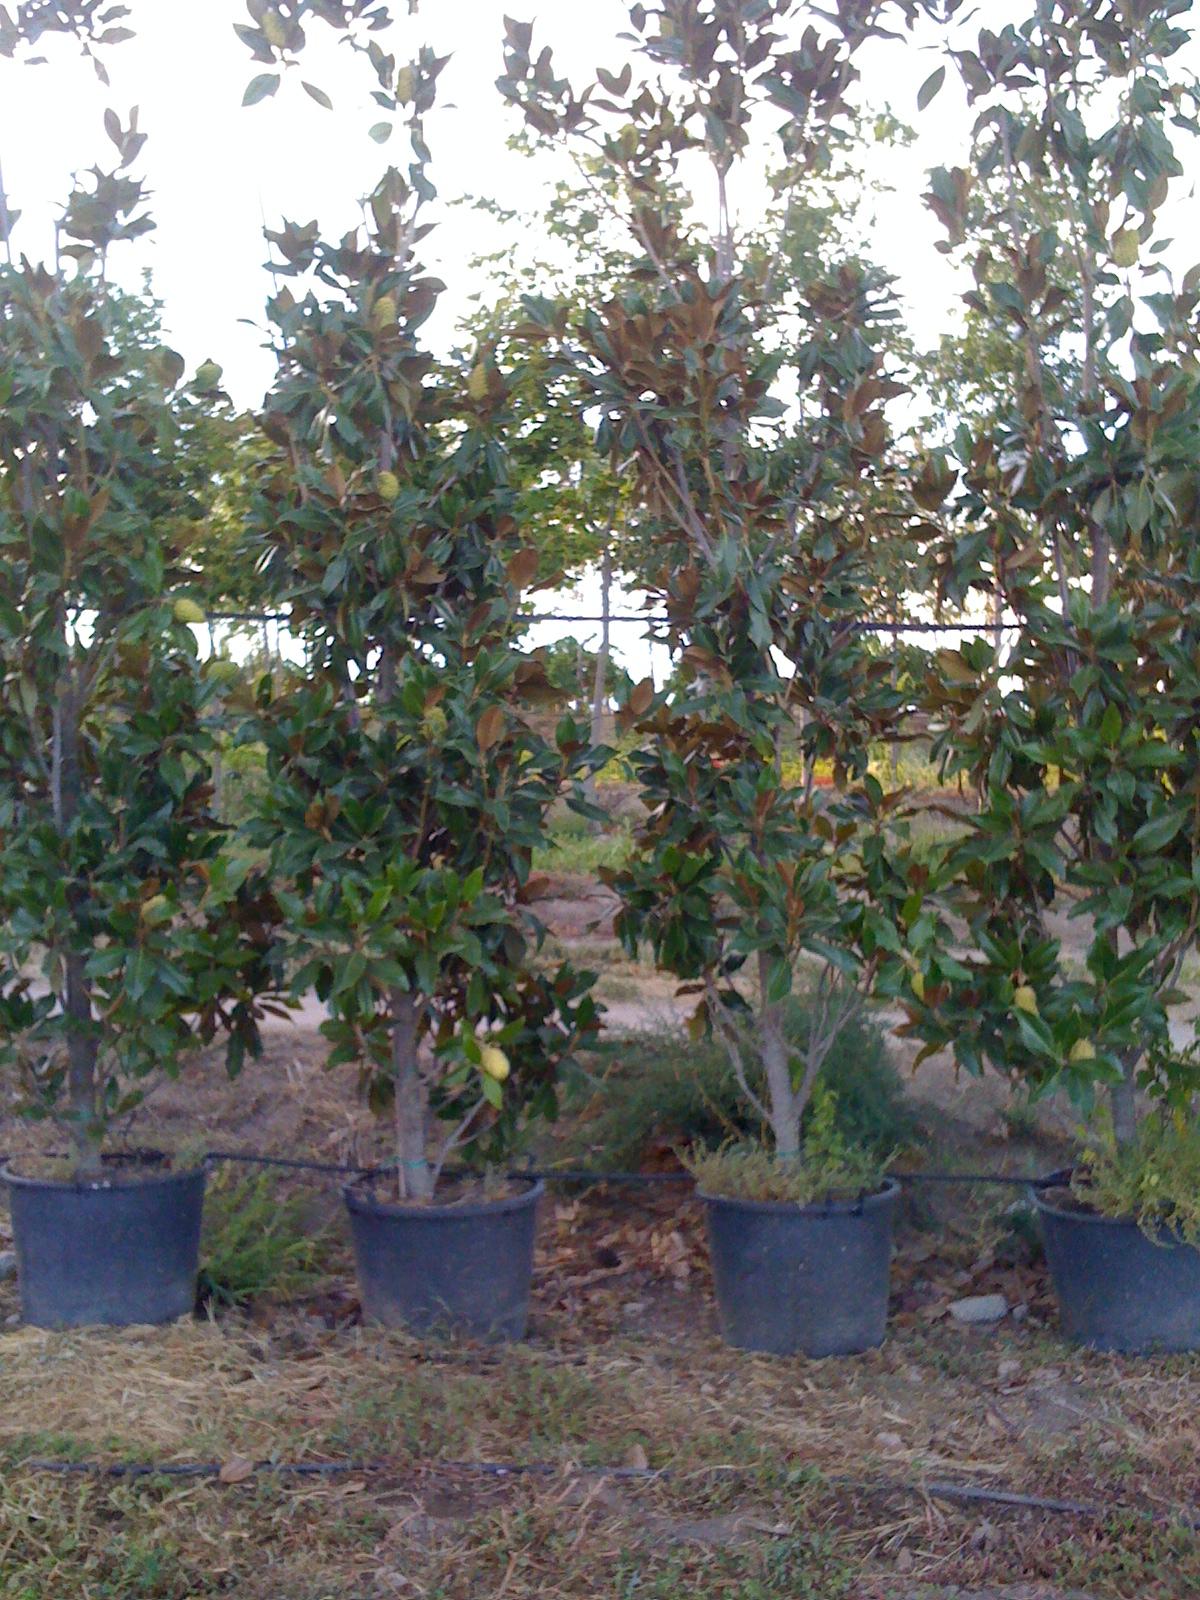 Vivero arboles ornamentales magnolia grandiflora for Vivero las magnolias